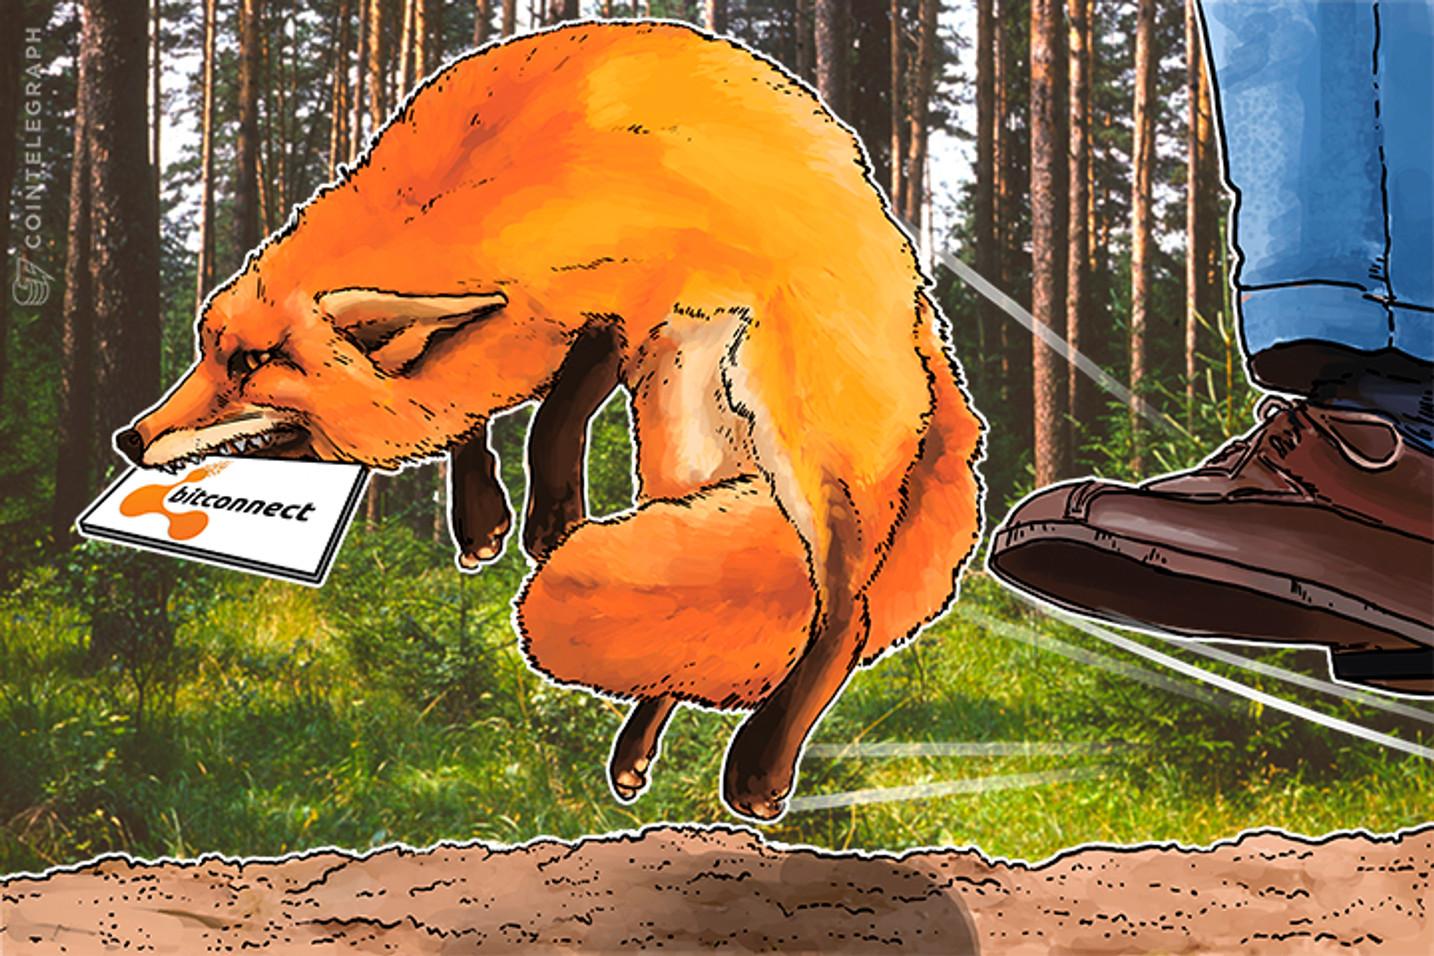 Bitconnect Ponzi Scheme - No Sympathy From Crypto Community